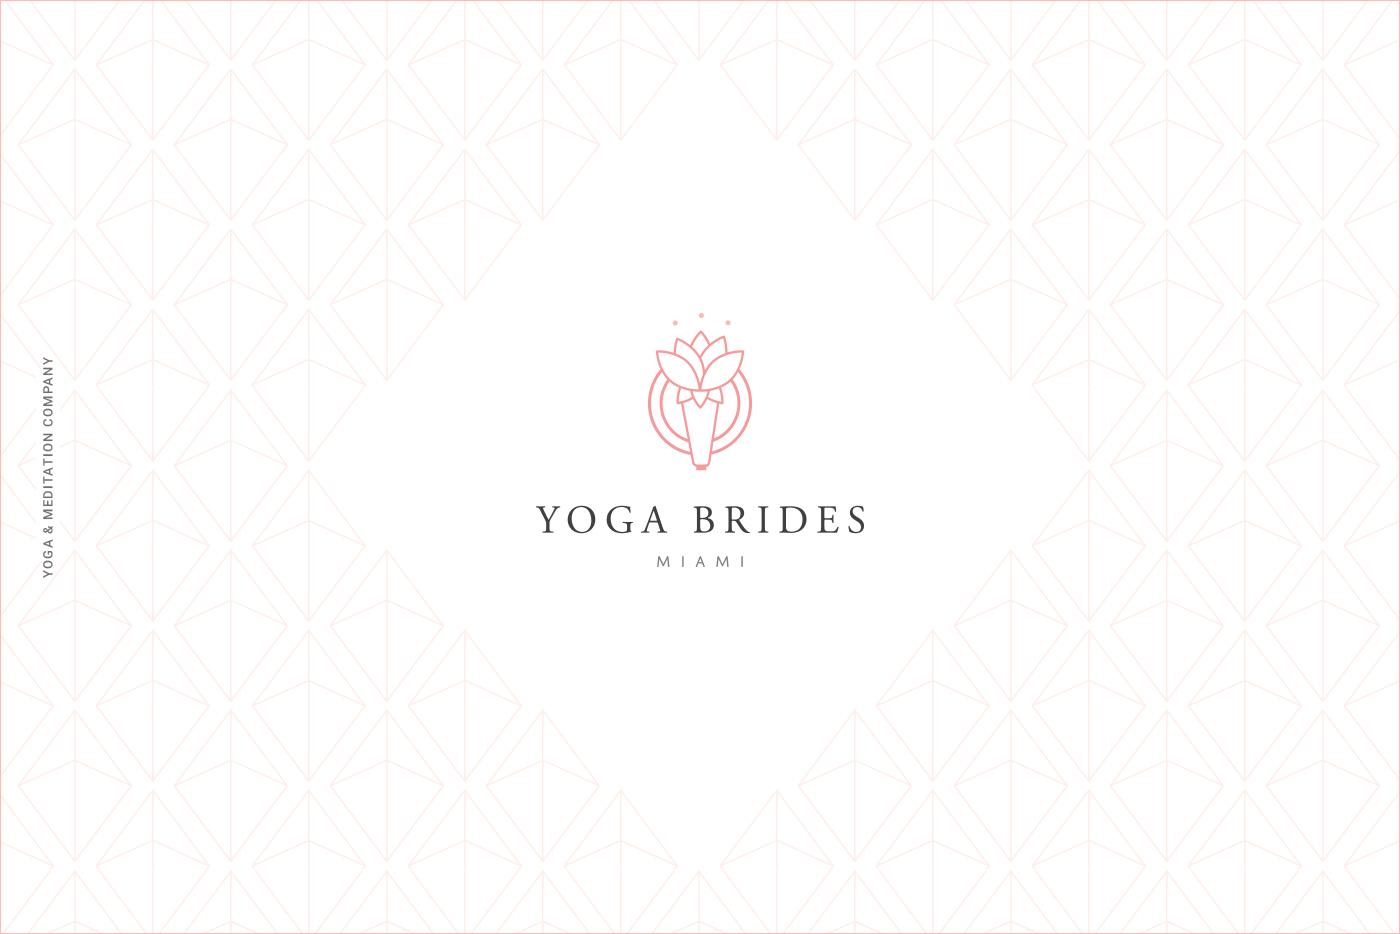 logo_YOGA-BRIDES.jpg